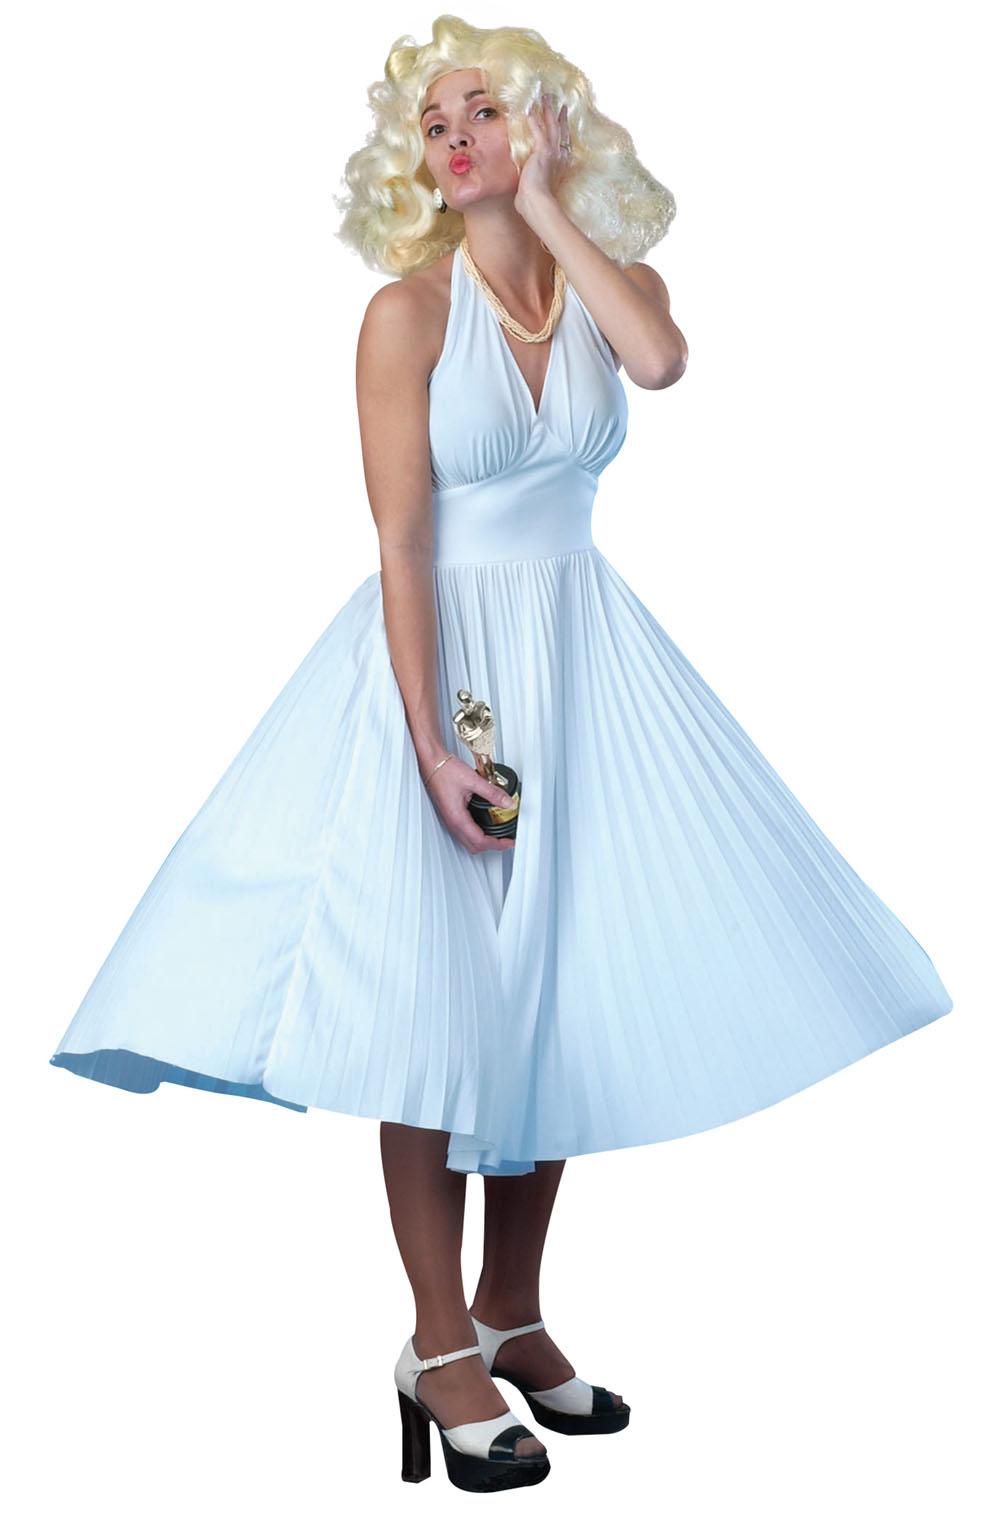 Ladies 1950s Hollywood Filmstar Marilyn 50s Star Fancy Dress Costume UK 10-12  sc 1 st  Fancy Dress 365 & Ladies 1950s Hollywood Filmstar Marilyn 50s Star Fancy Dress Costume ...